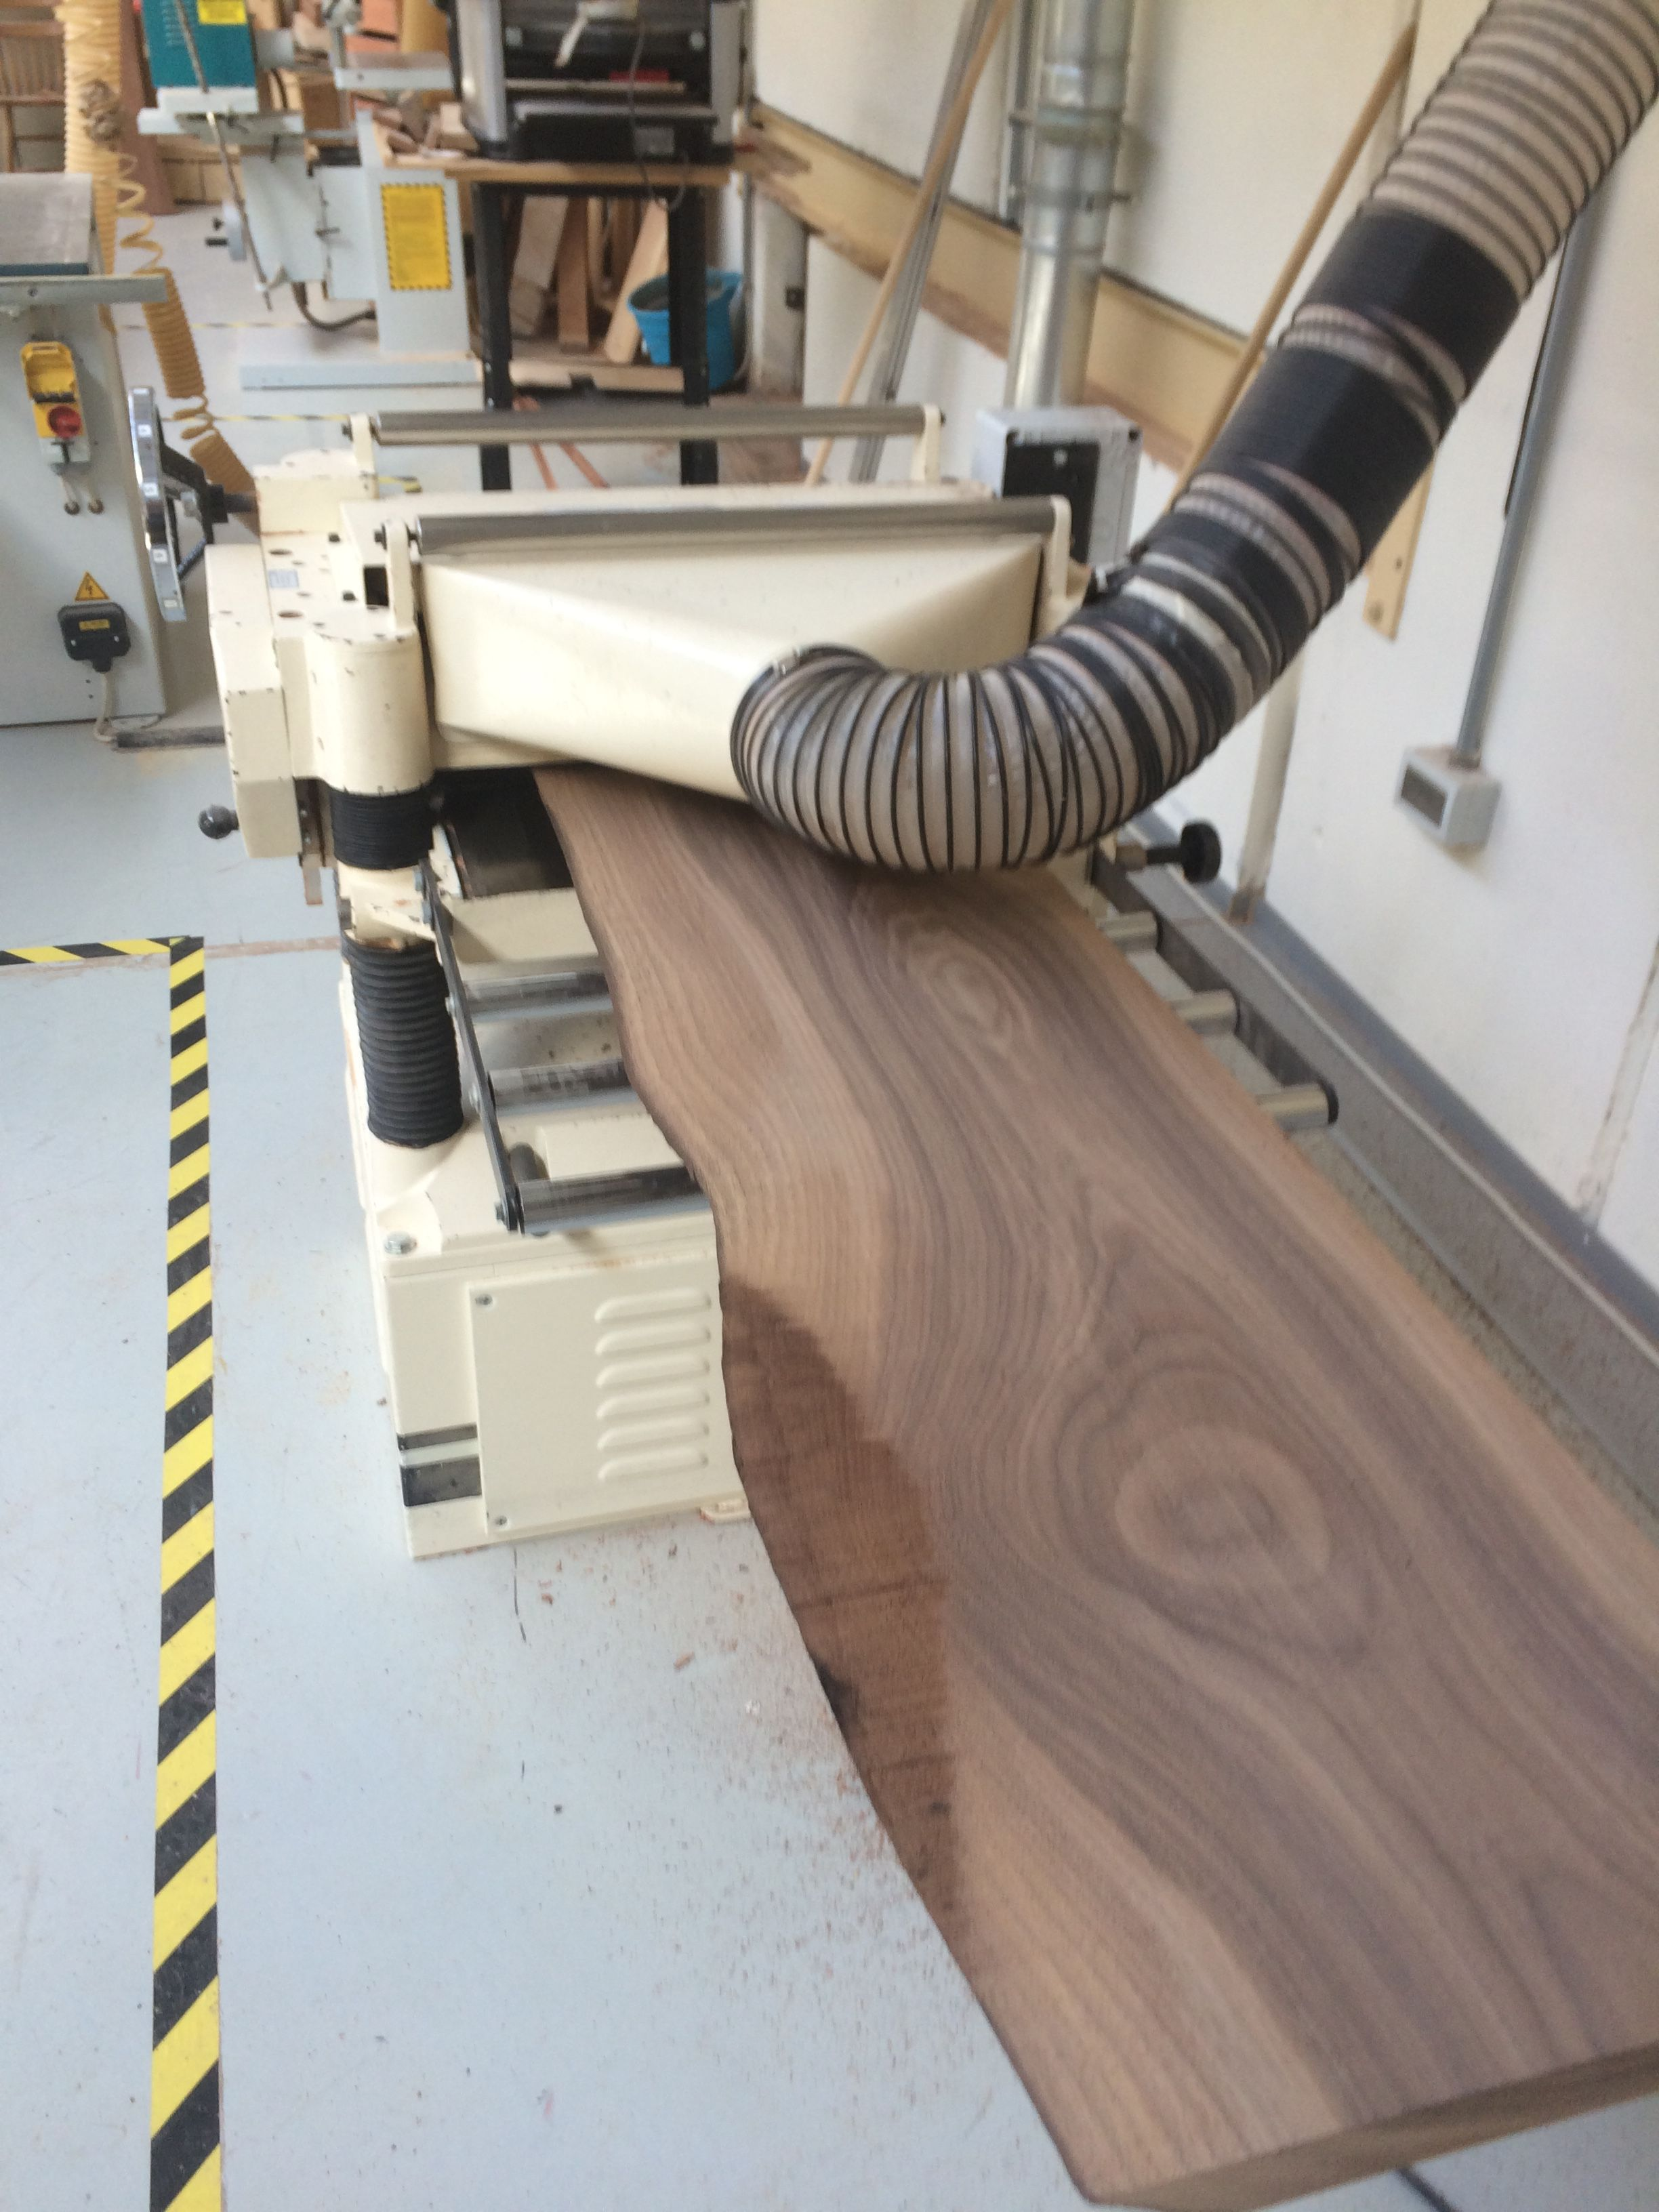 Live Edge Walnut | Live edge, Wood projects, Wood